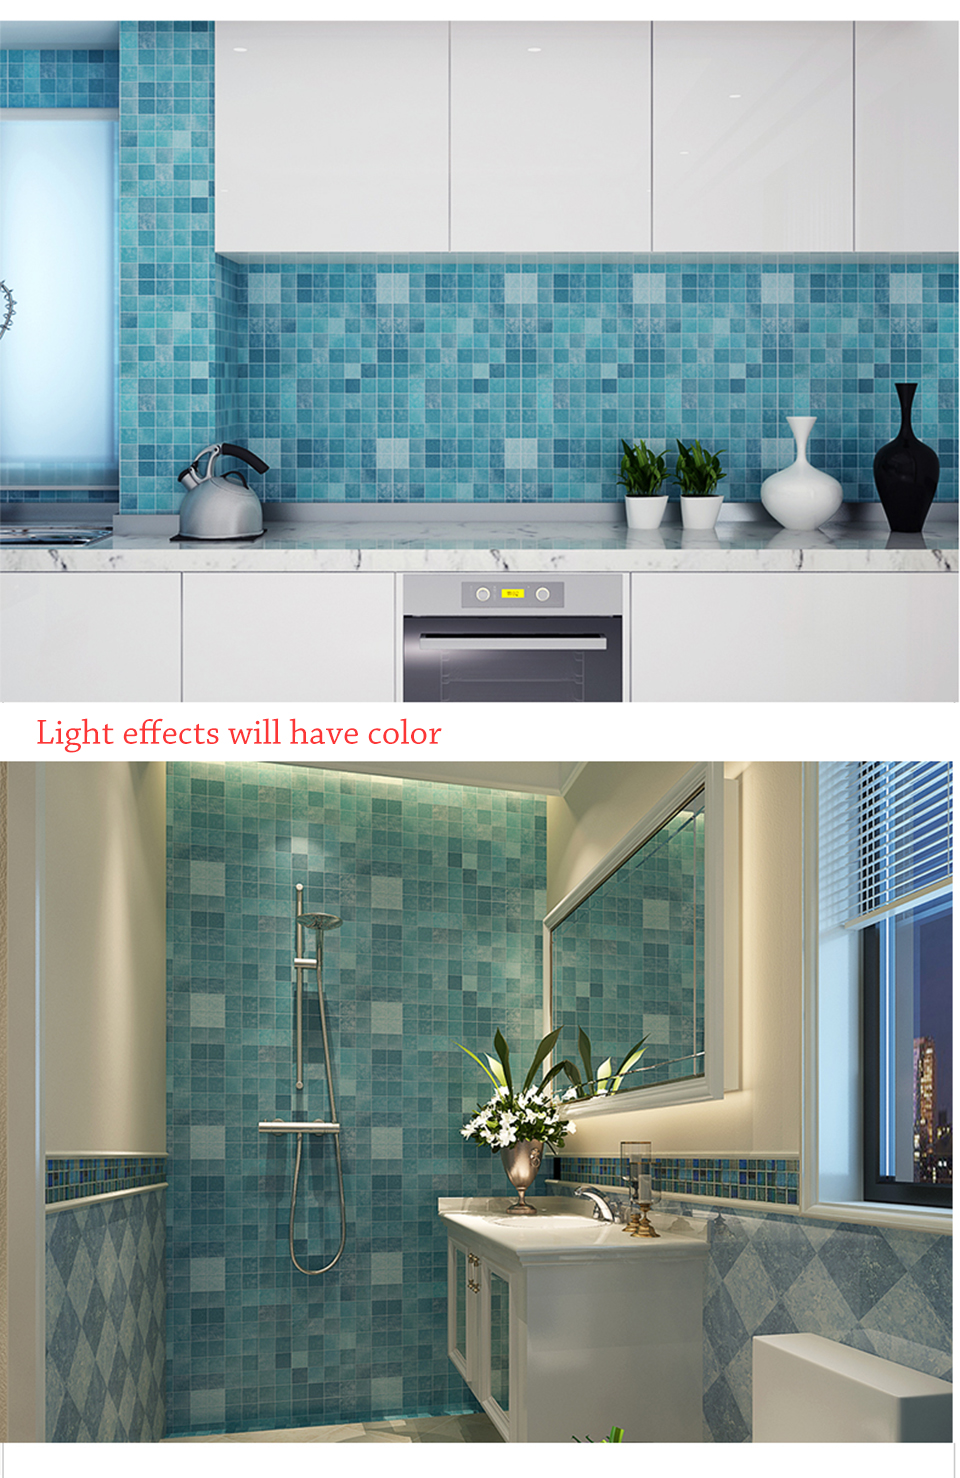 5M PVC Wall Sticker Bathroom Waterproof Self adhesive Wallpaper ...